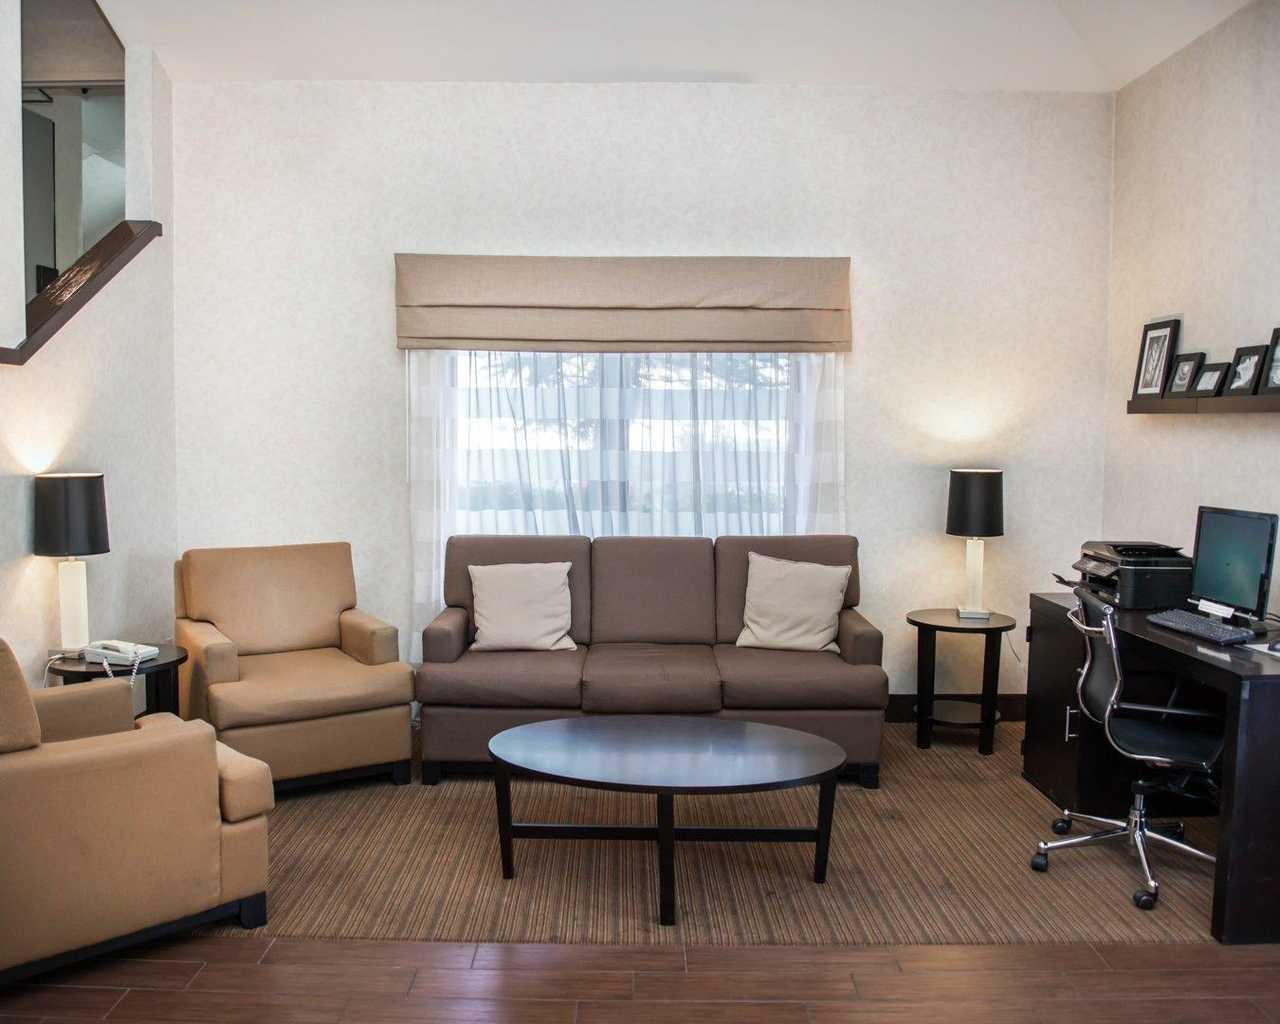 Sleep Inn University Place Charlotte - Lobby-3